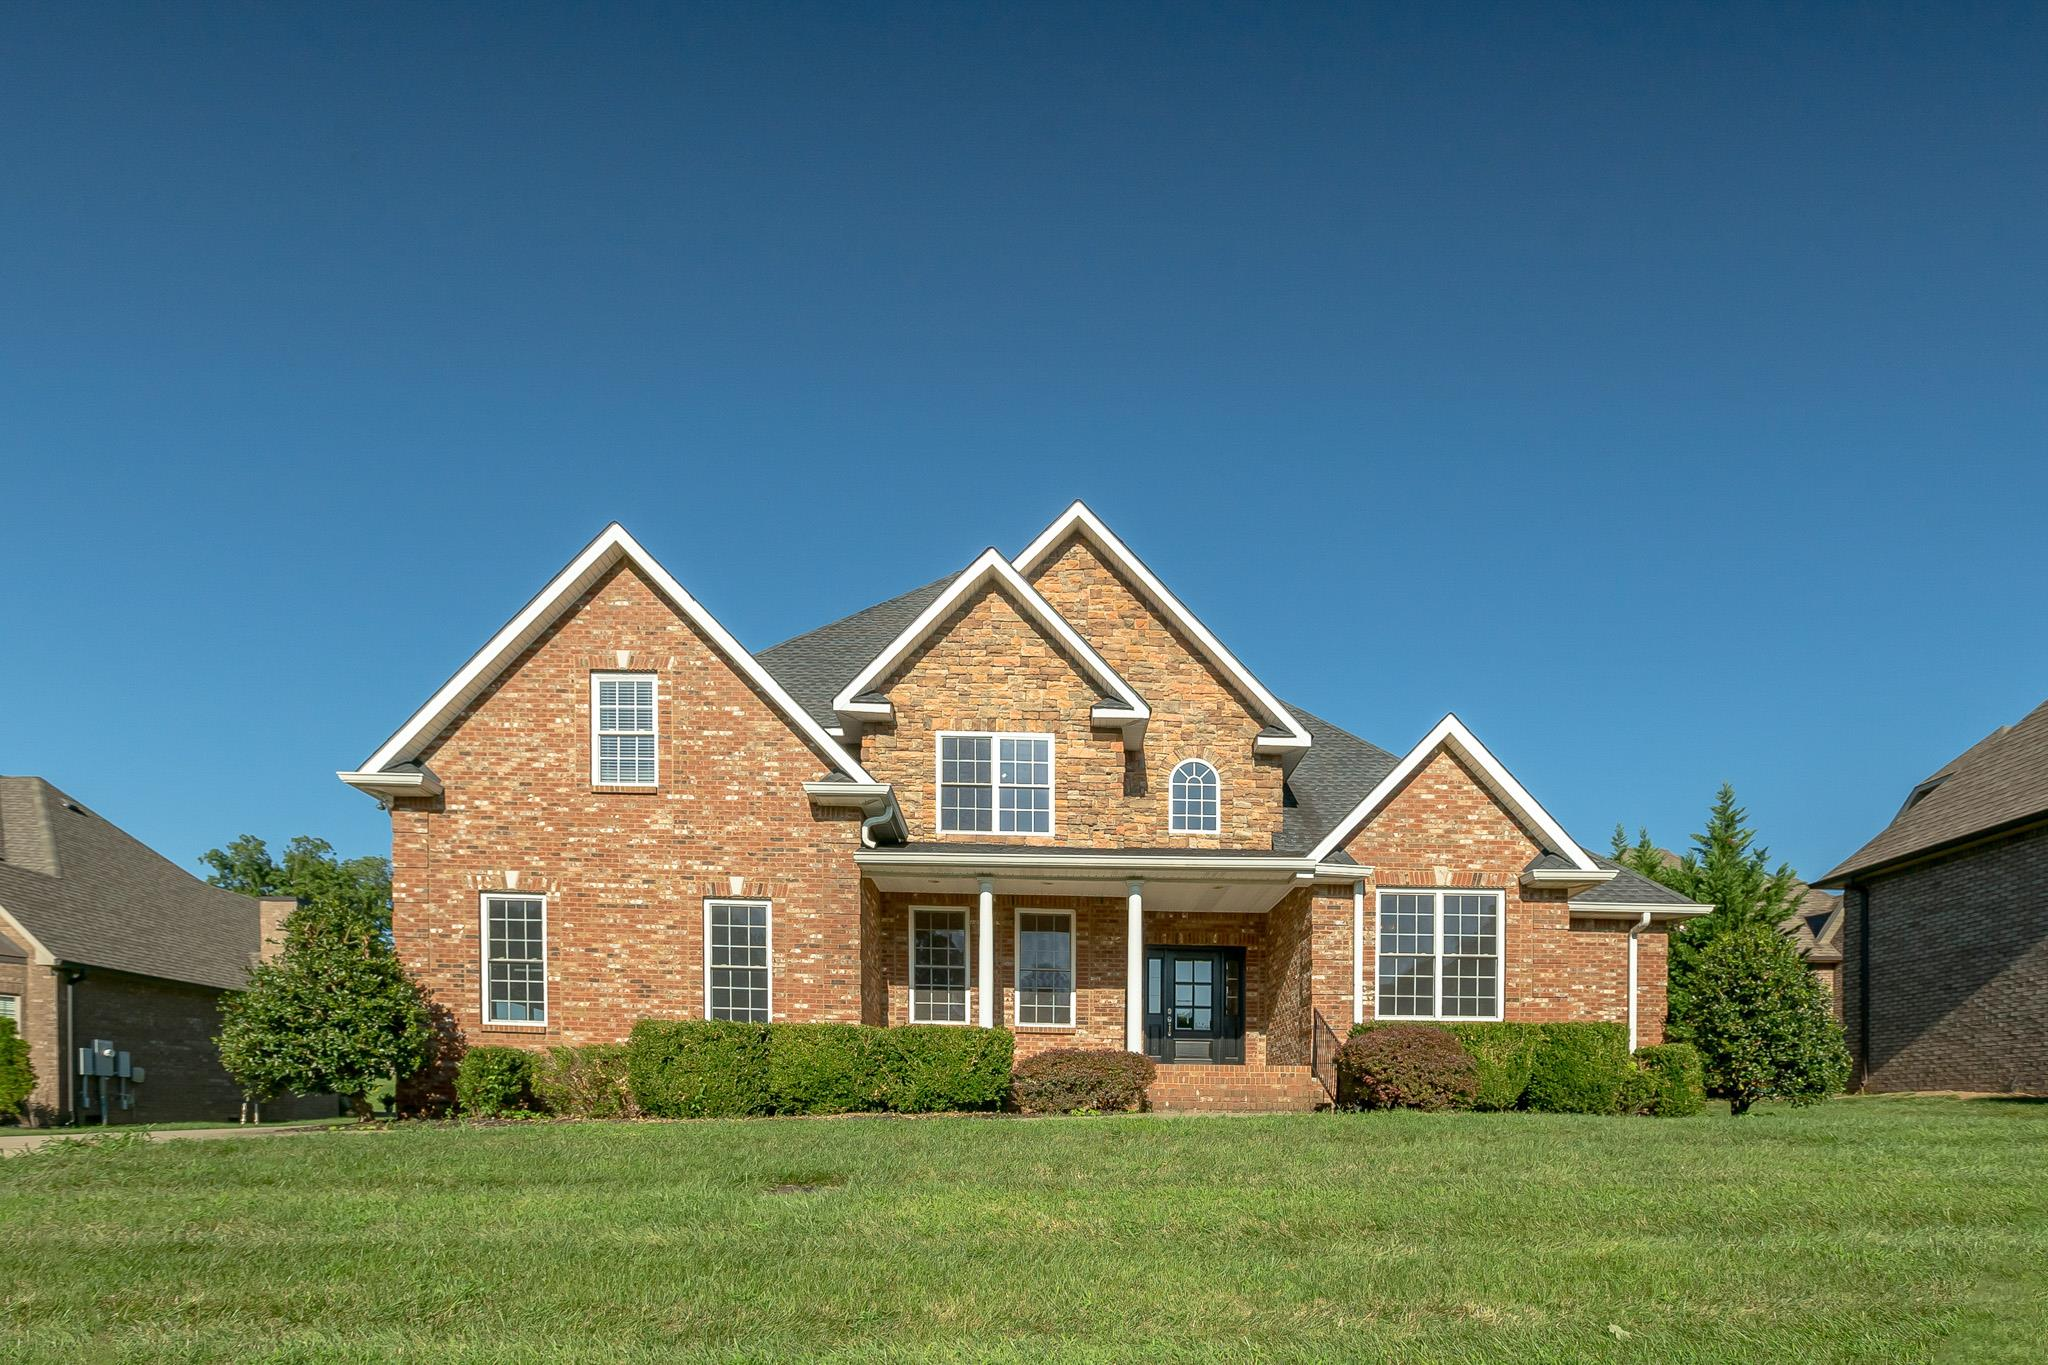 2456 Settlers Trce, Clarksville, TN 37040 - Clarksville, TN real estate listing